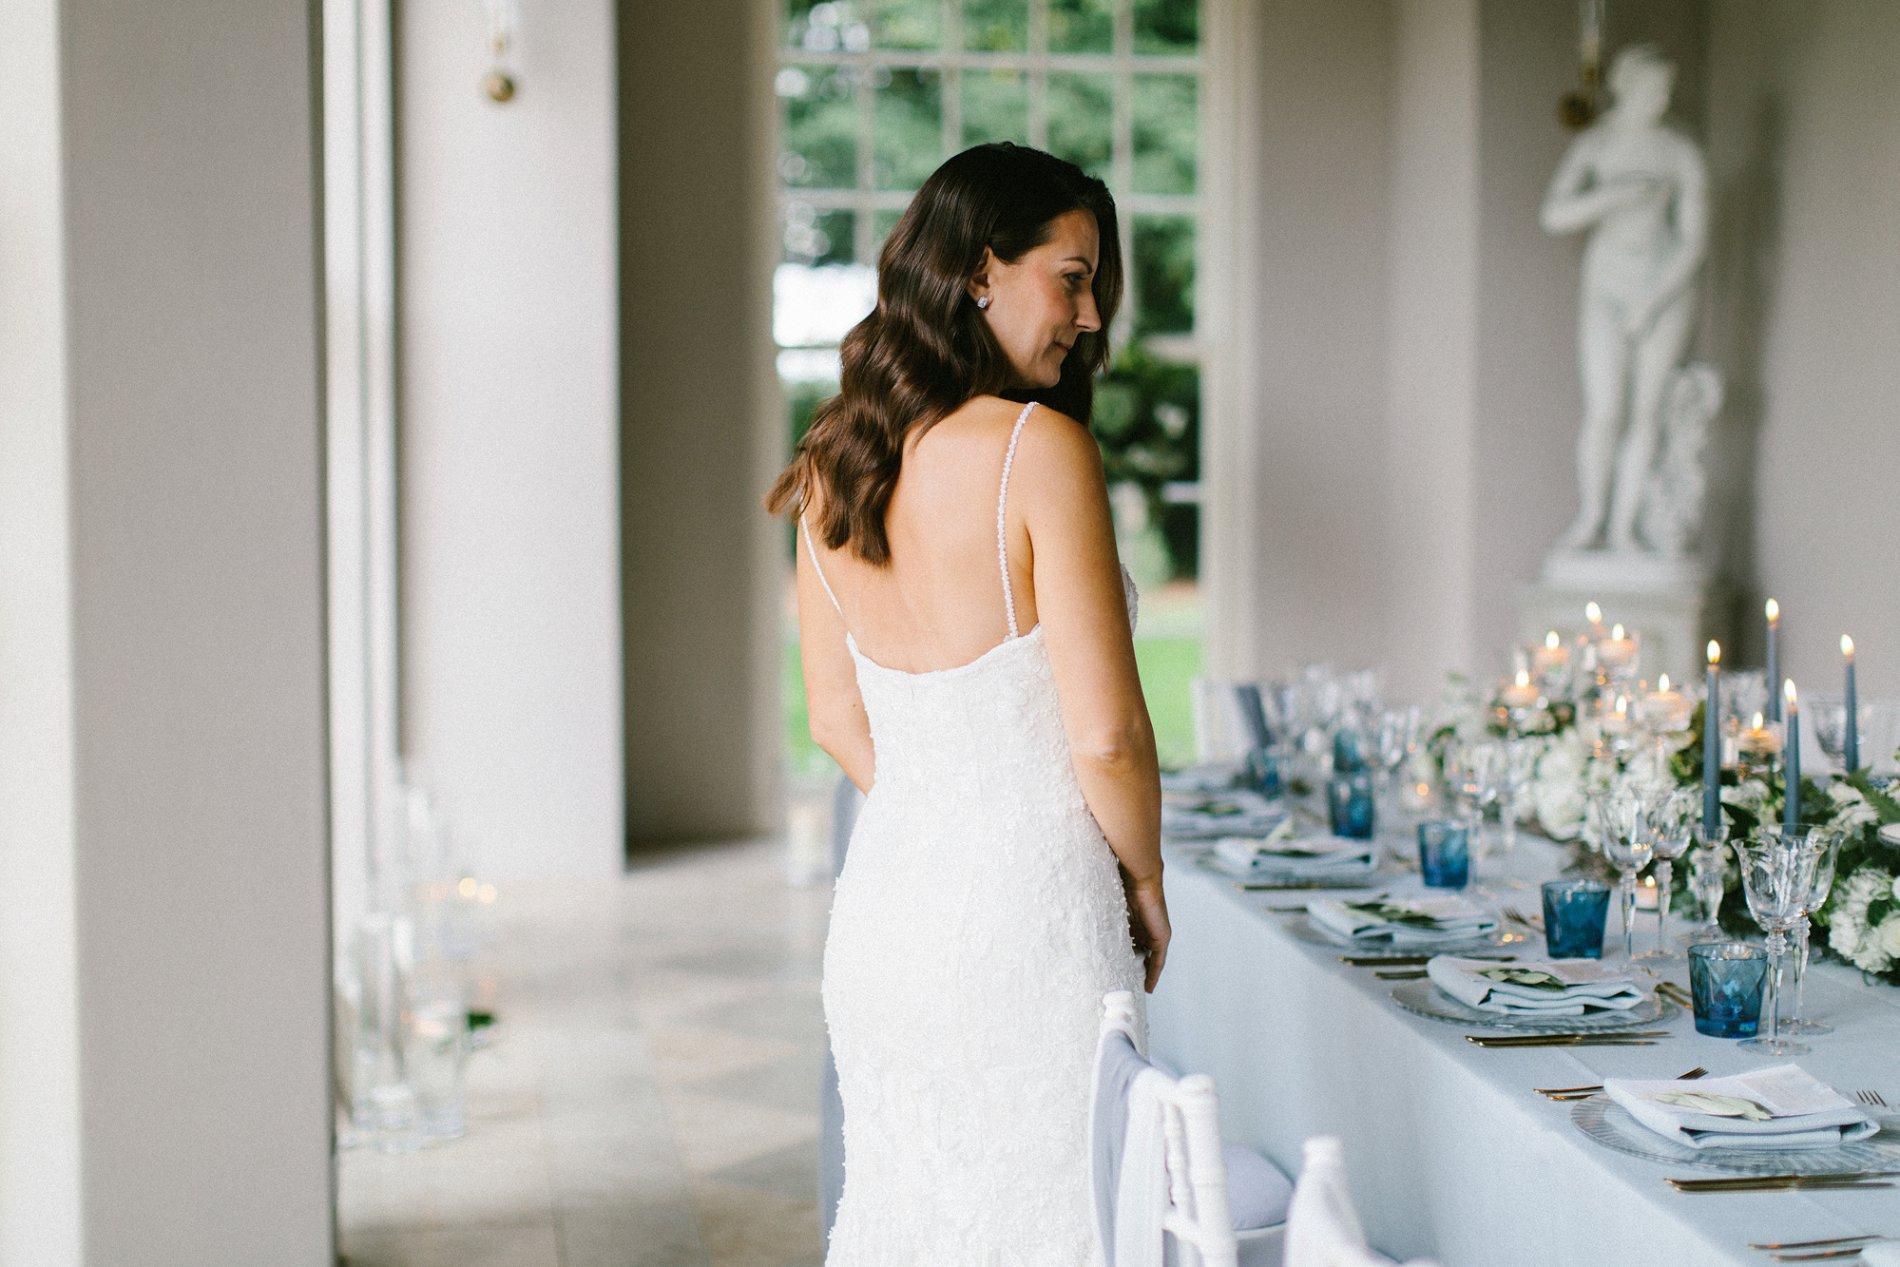 An Intimate Fine Art Wedding Shoot at Newby Hall (c) Melissa Beattie Photography (38)